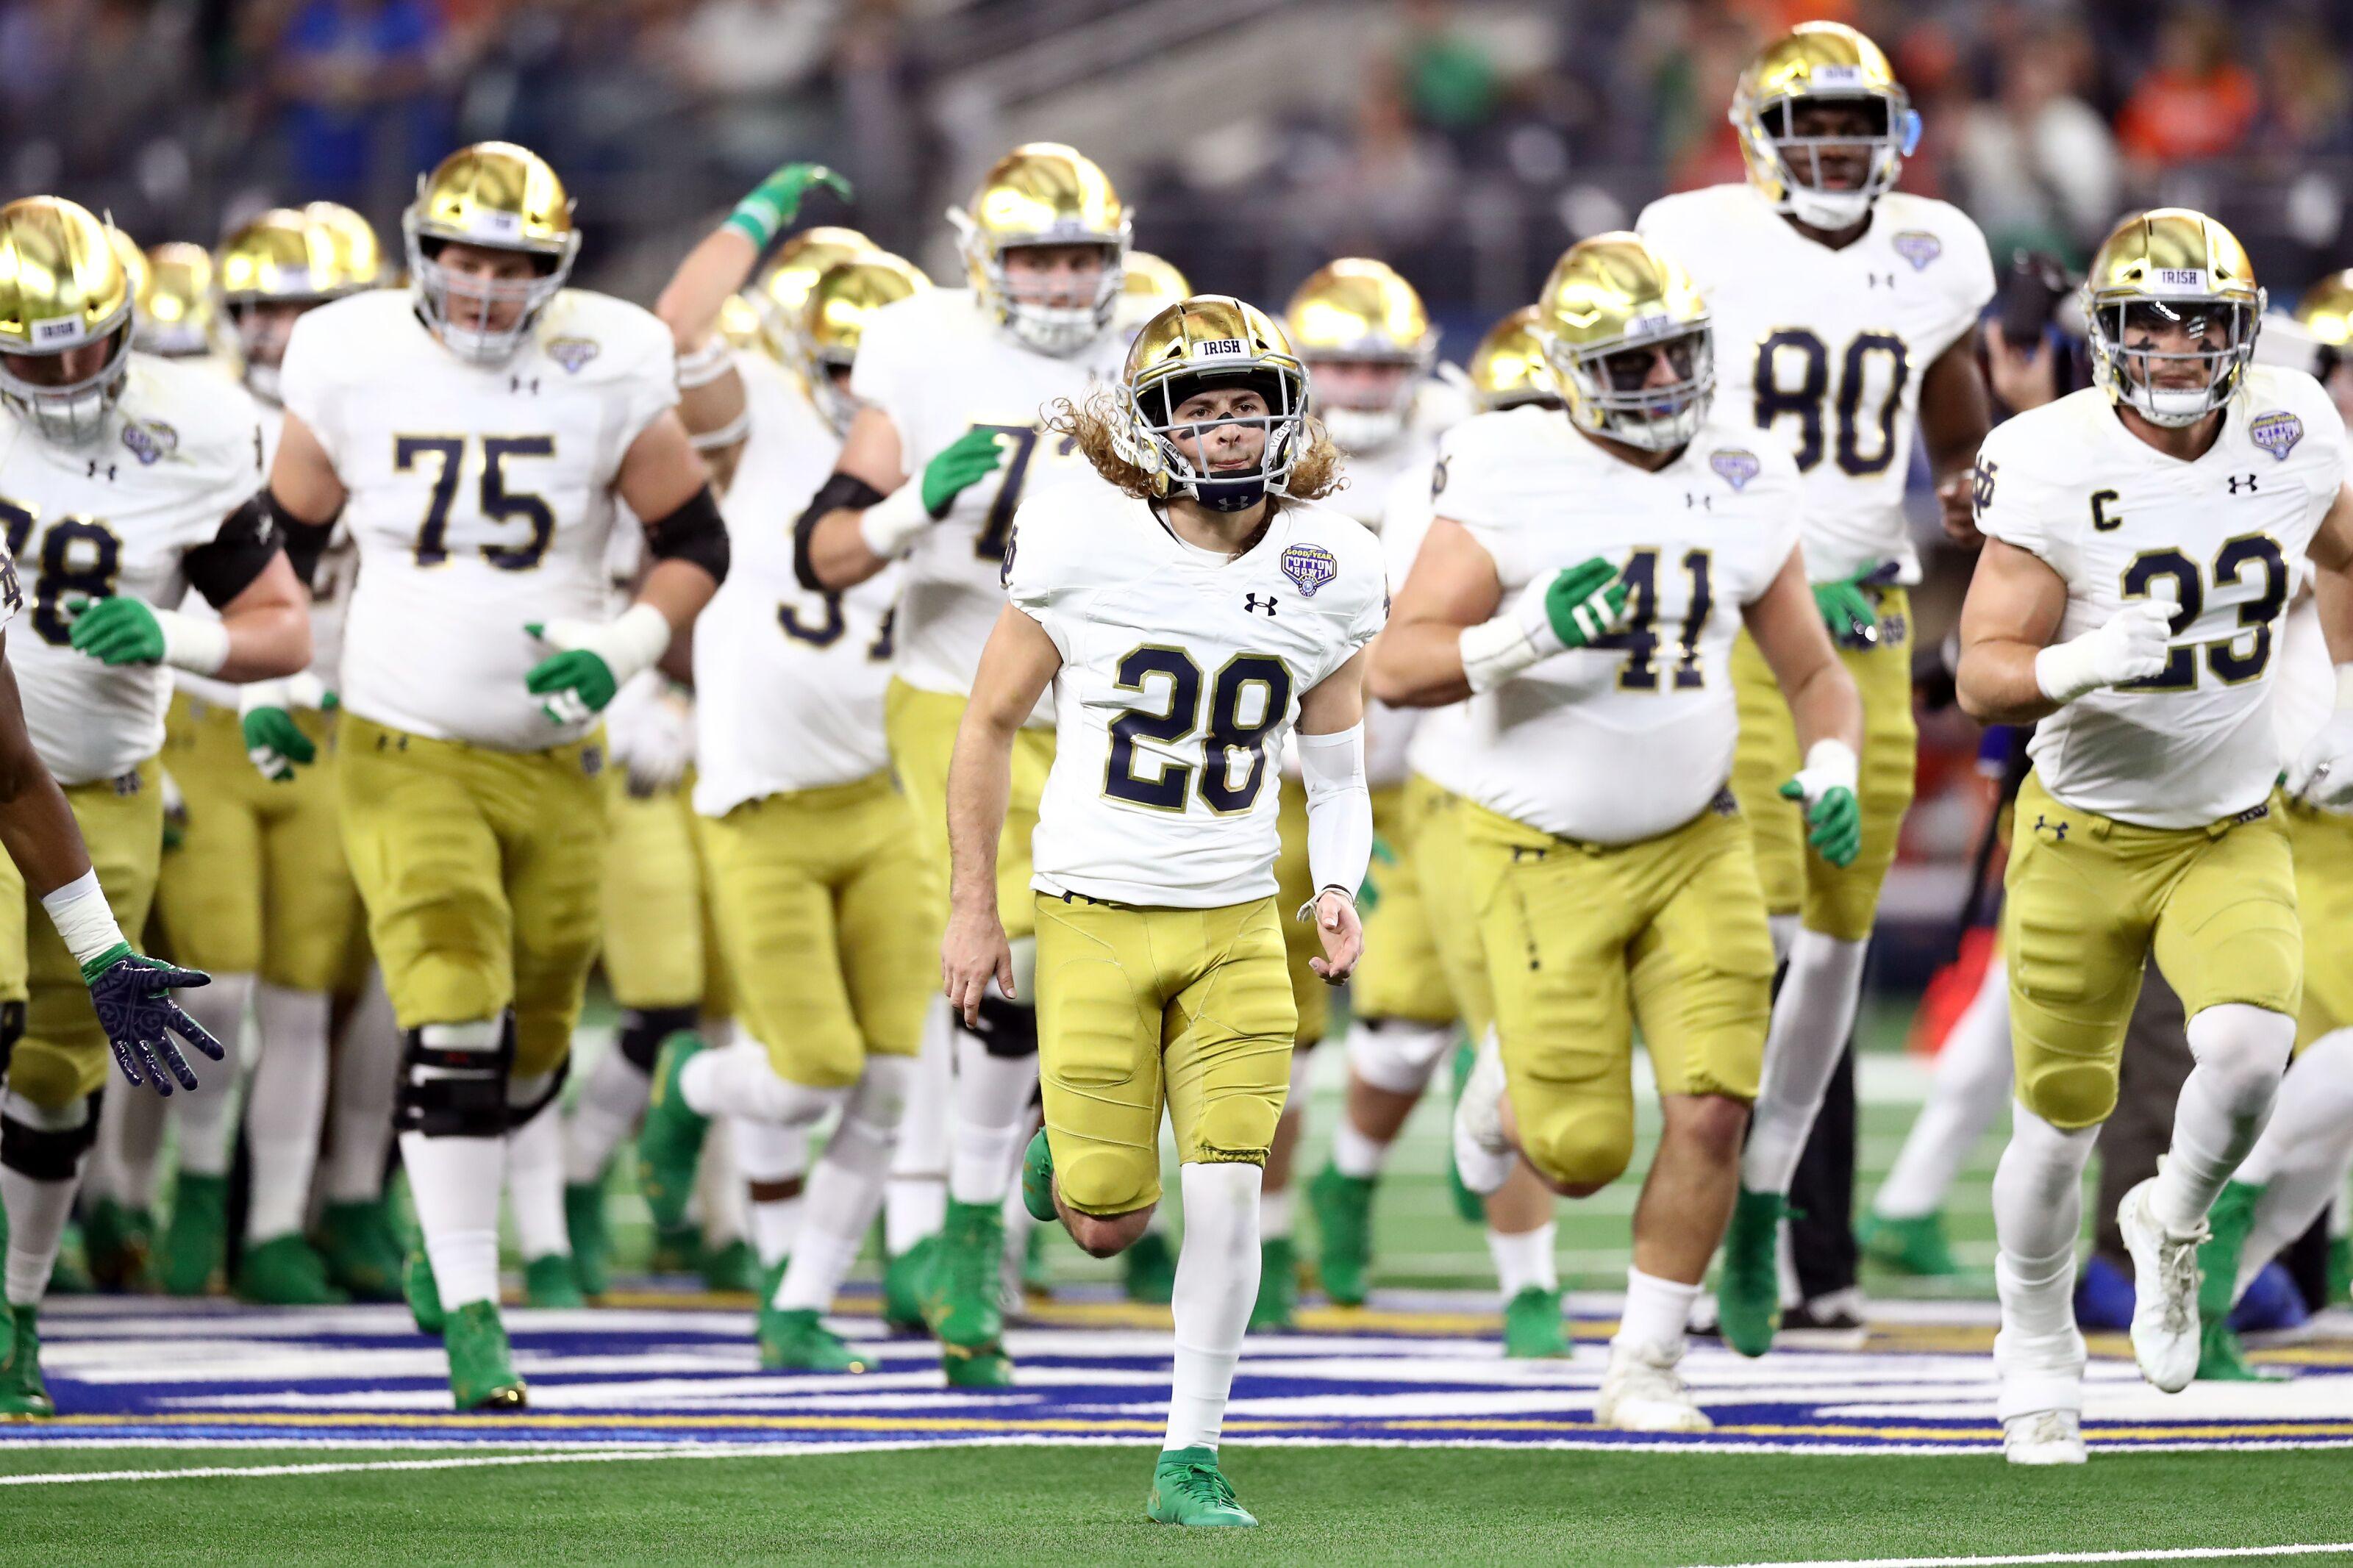 Best case, worst case scenarios for Notre Dame football in 2019